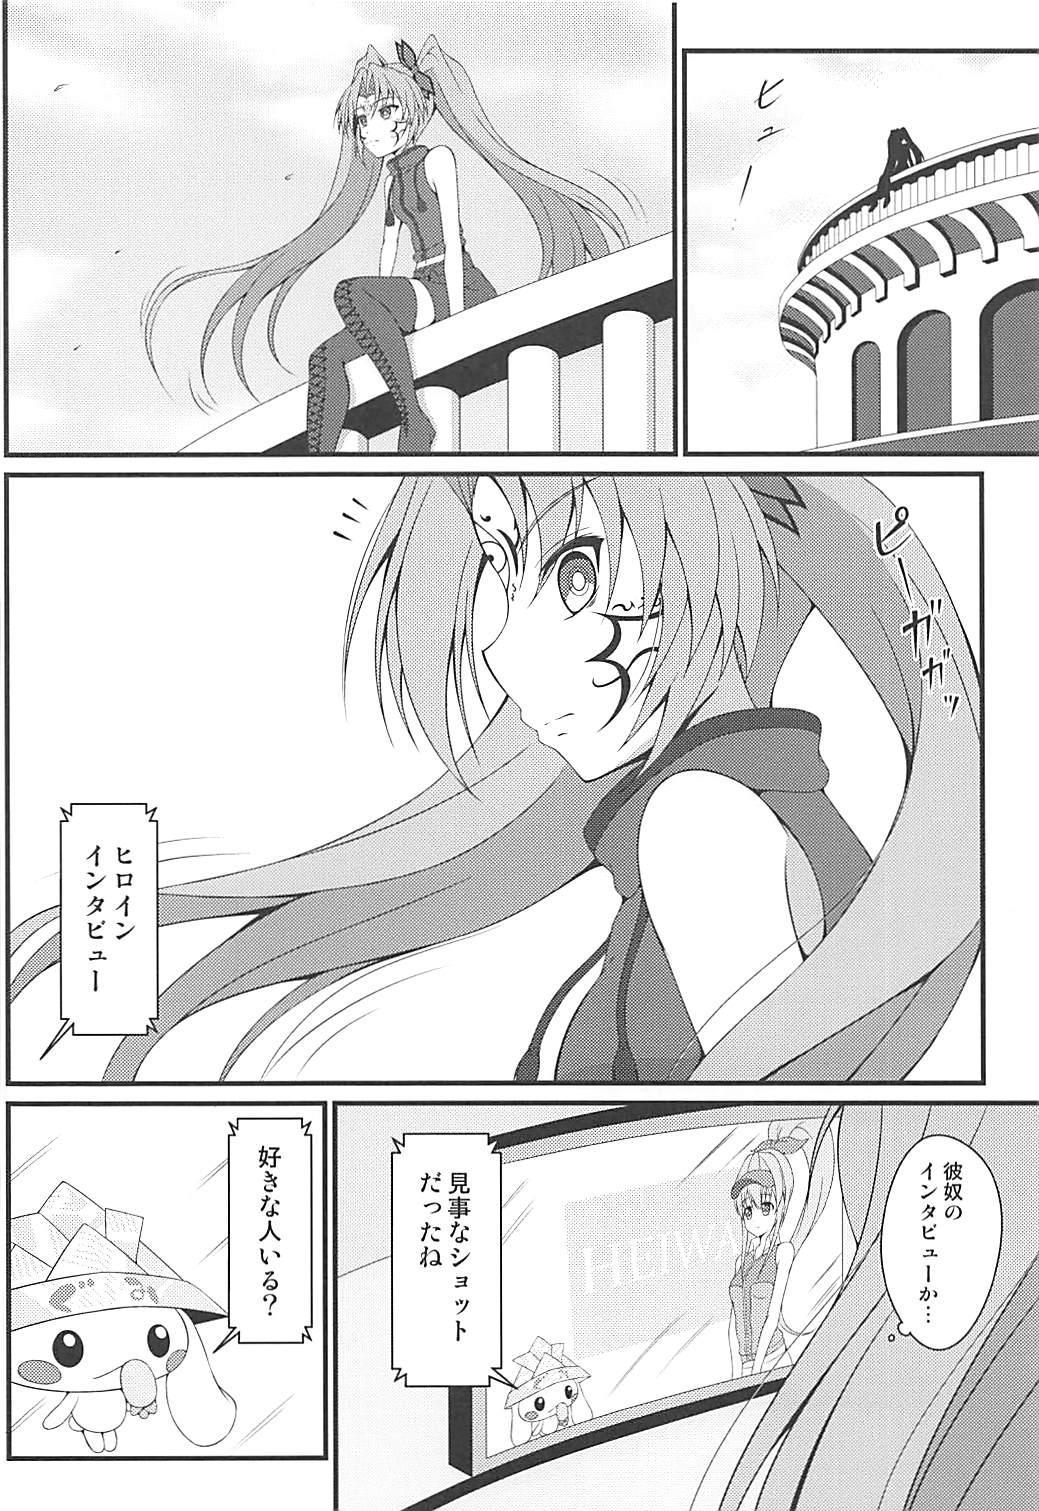 Shinshoku Otome 4